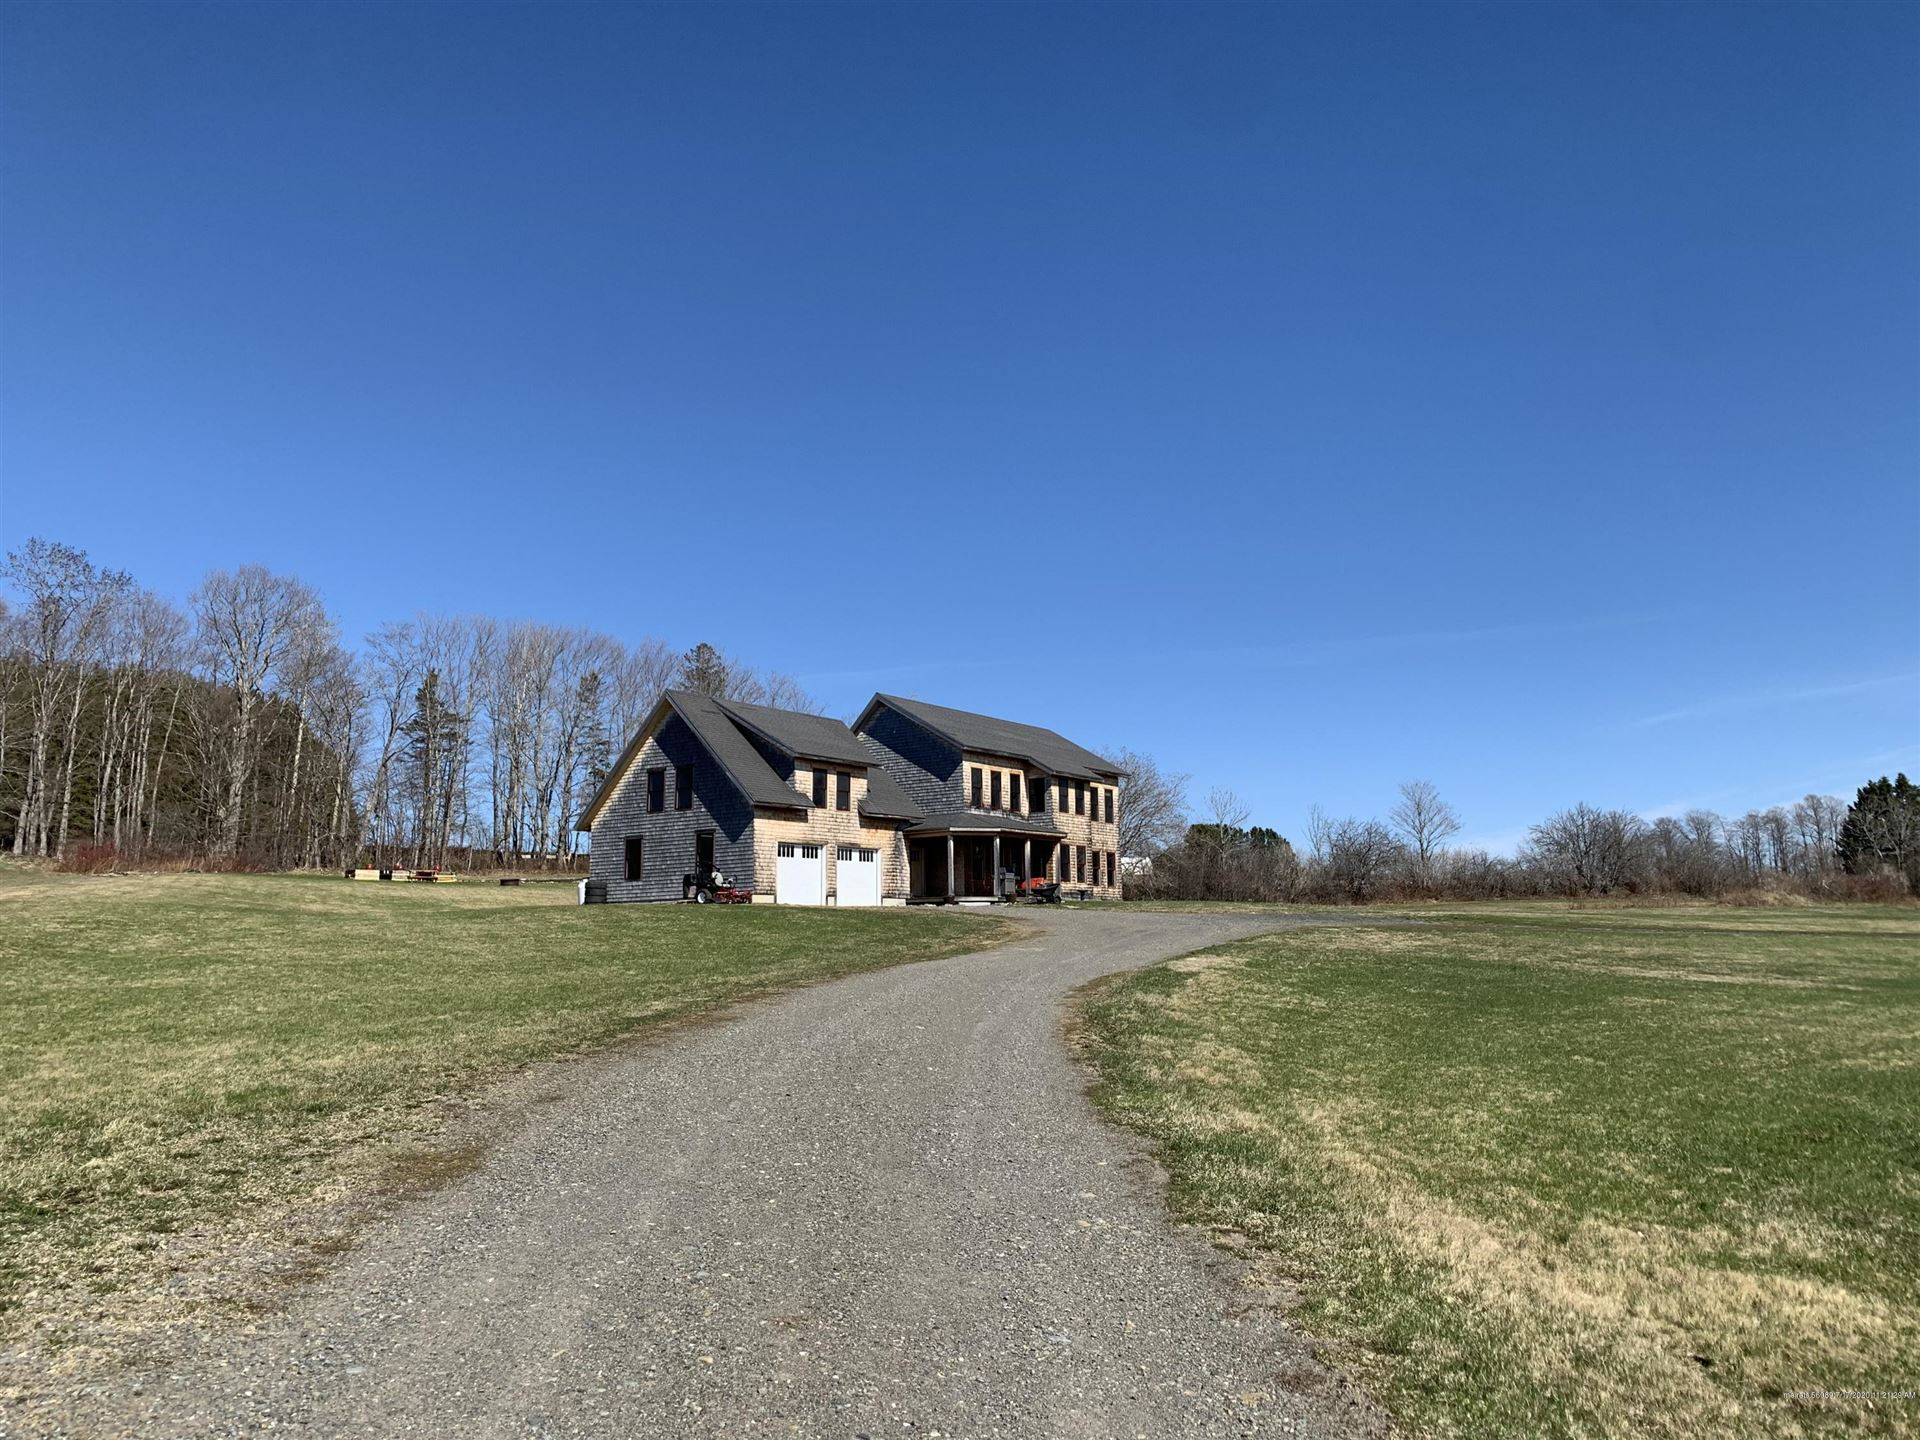 Photo of 431 Parkhurst Siding Road, Presque Isle, ME 04769 (MLS # 1456714)